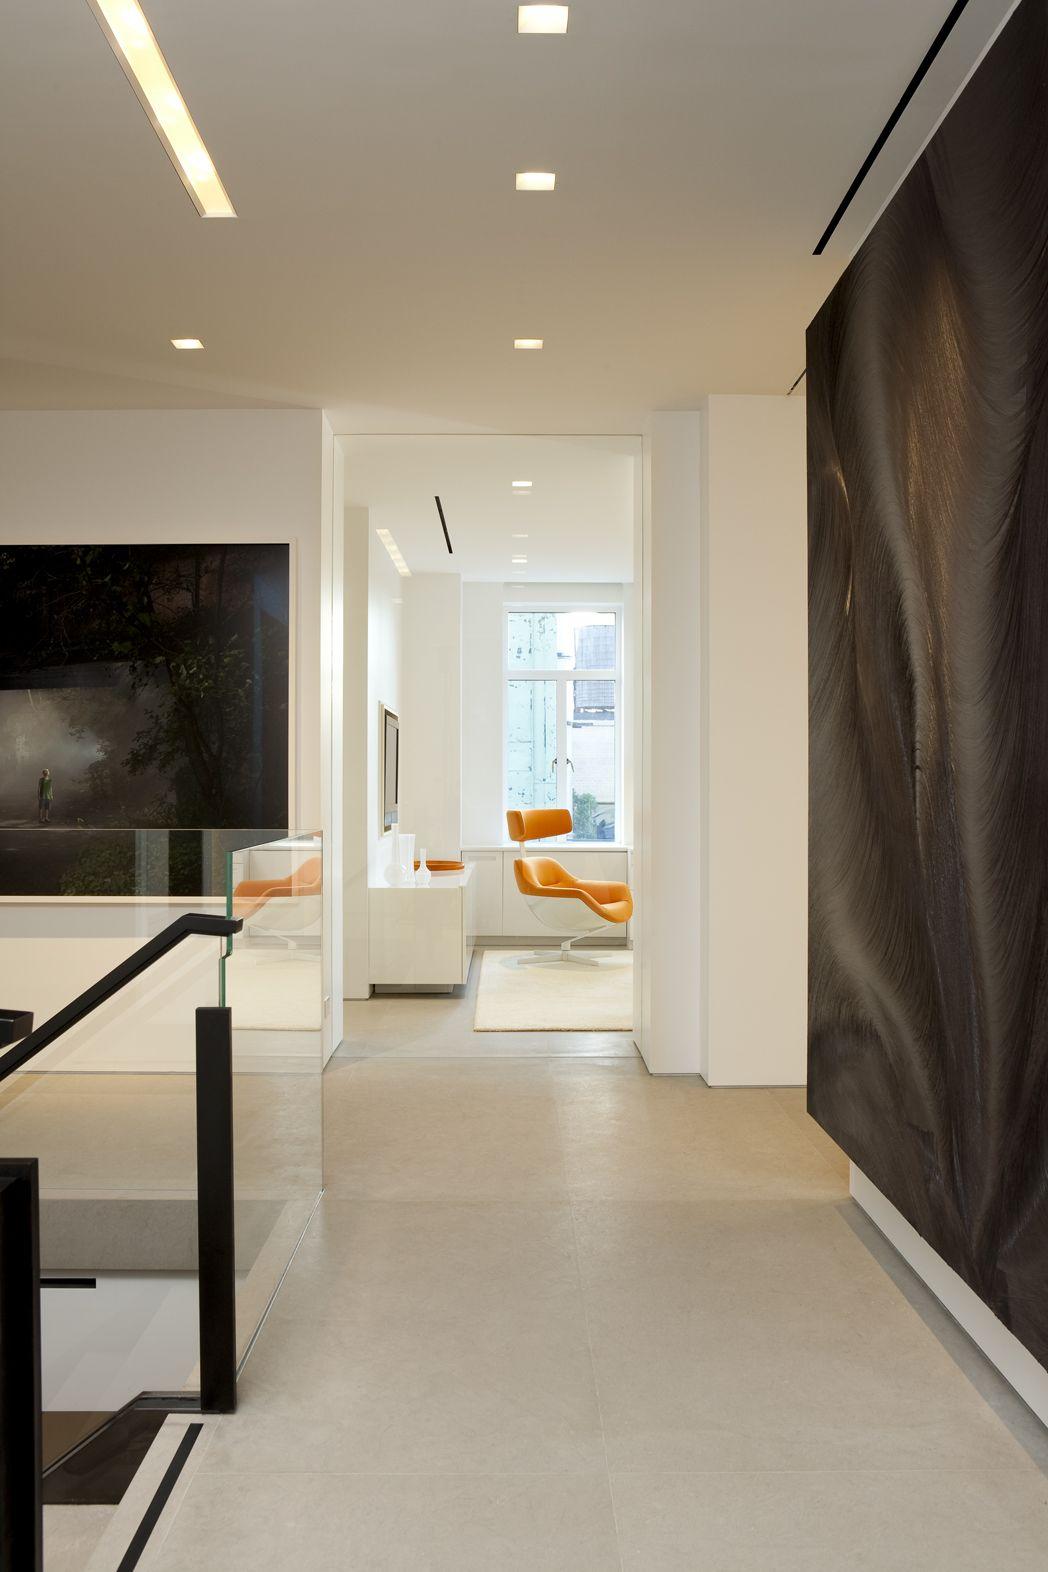 Valentina Passerini Interior Design Dedicated To Deliver Superior Interior Acoustic Experince Www Bedreakustik Dk Home Residential Design Home Modern Design